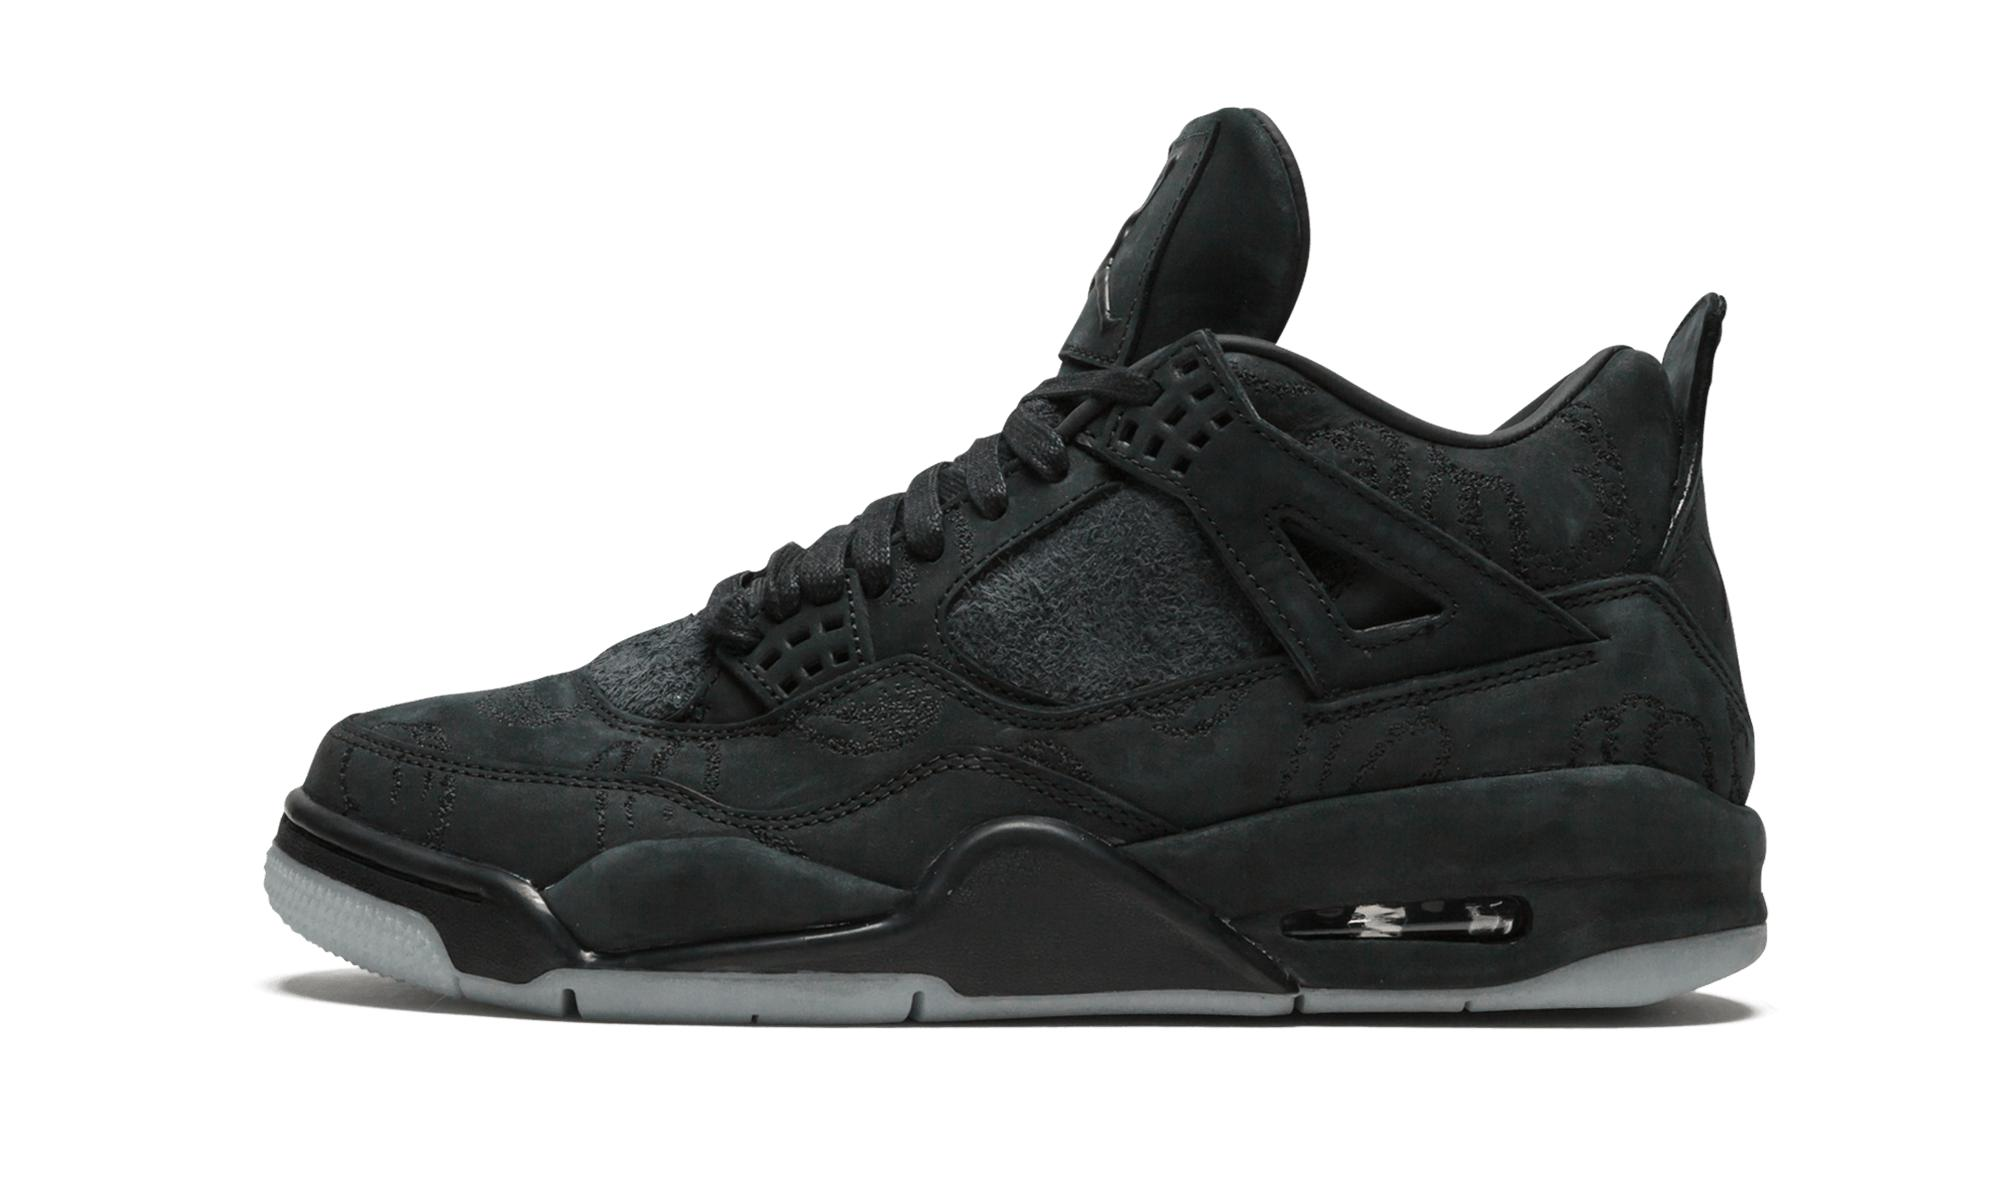 027c035d682 Lyst - Nike Air 4 Retro Kaws in Black for Men - Save 3%